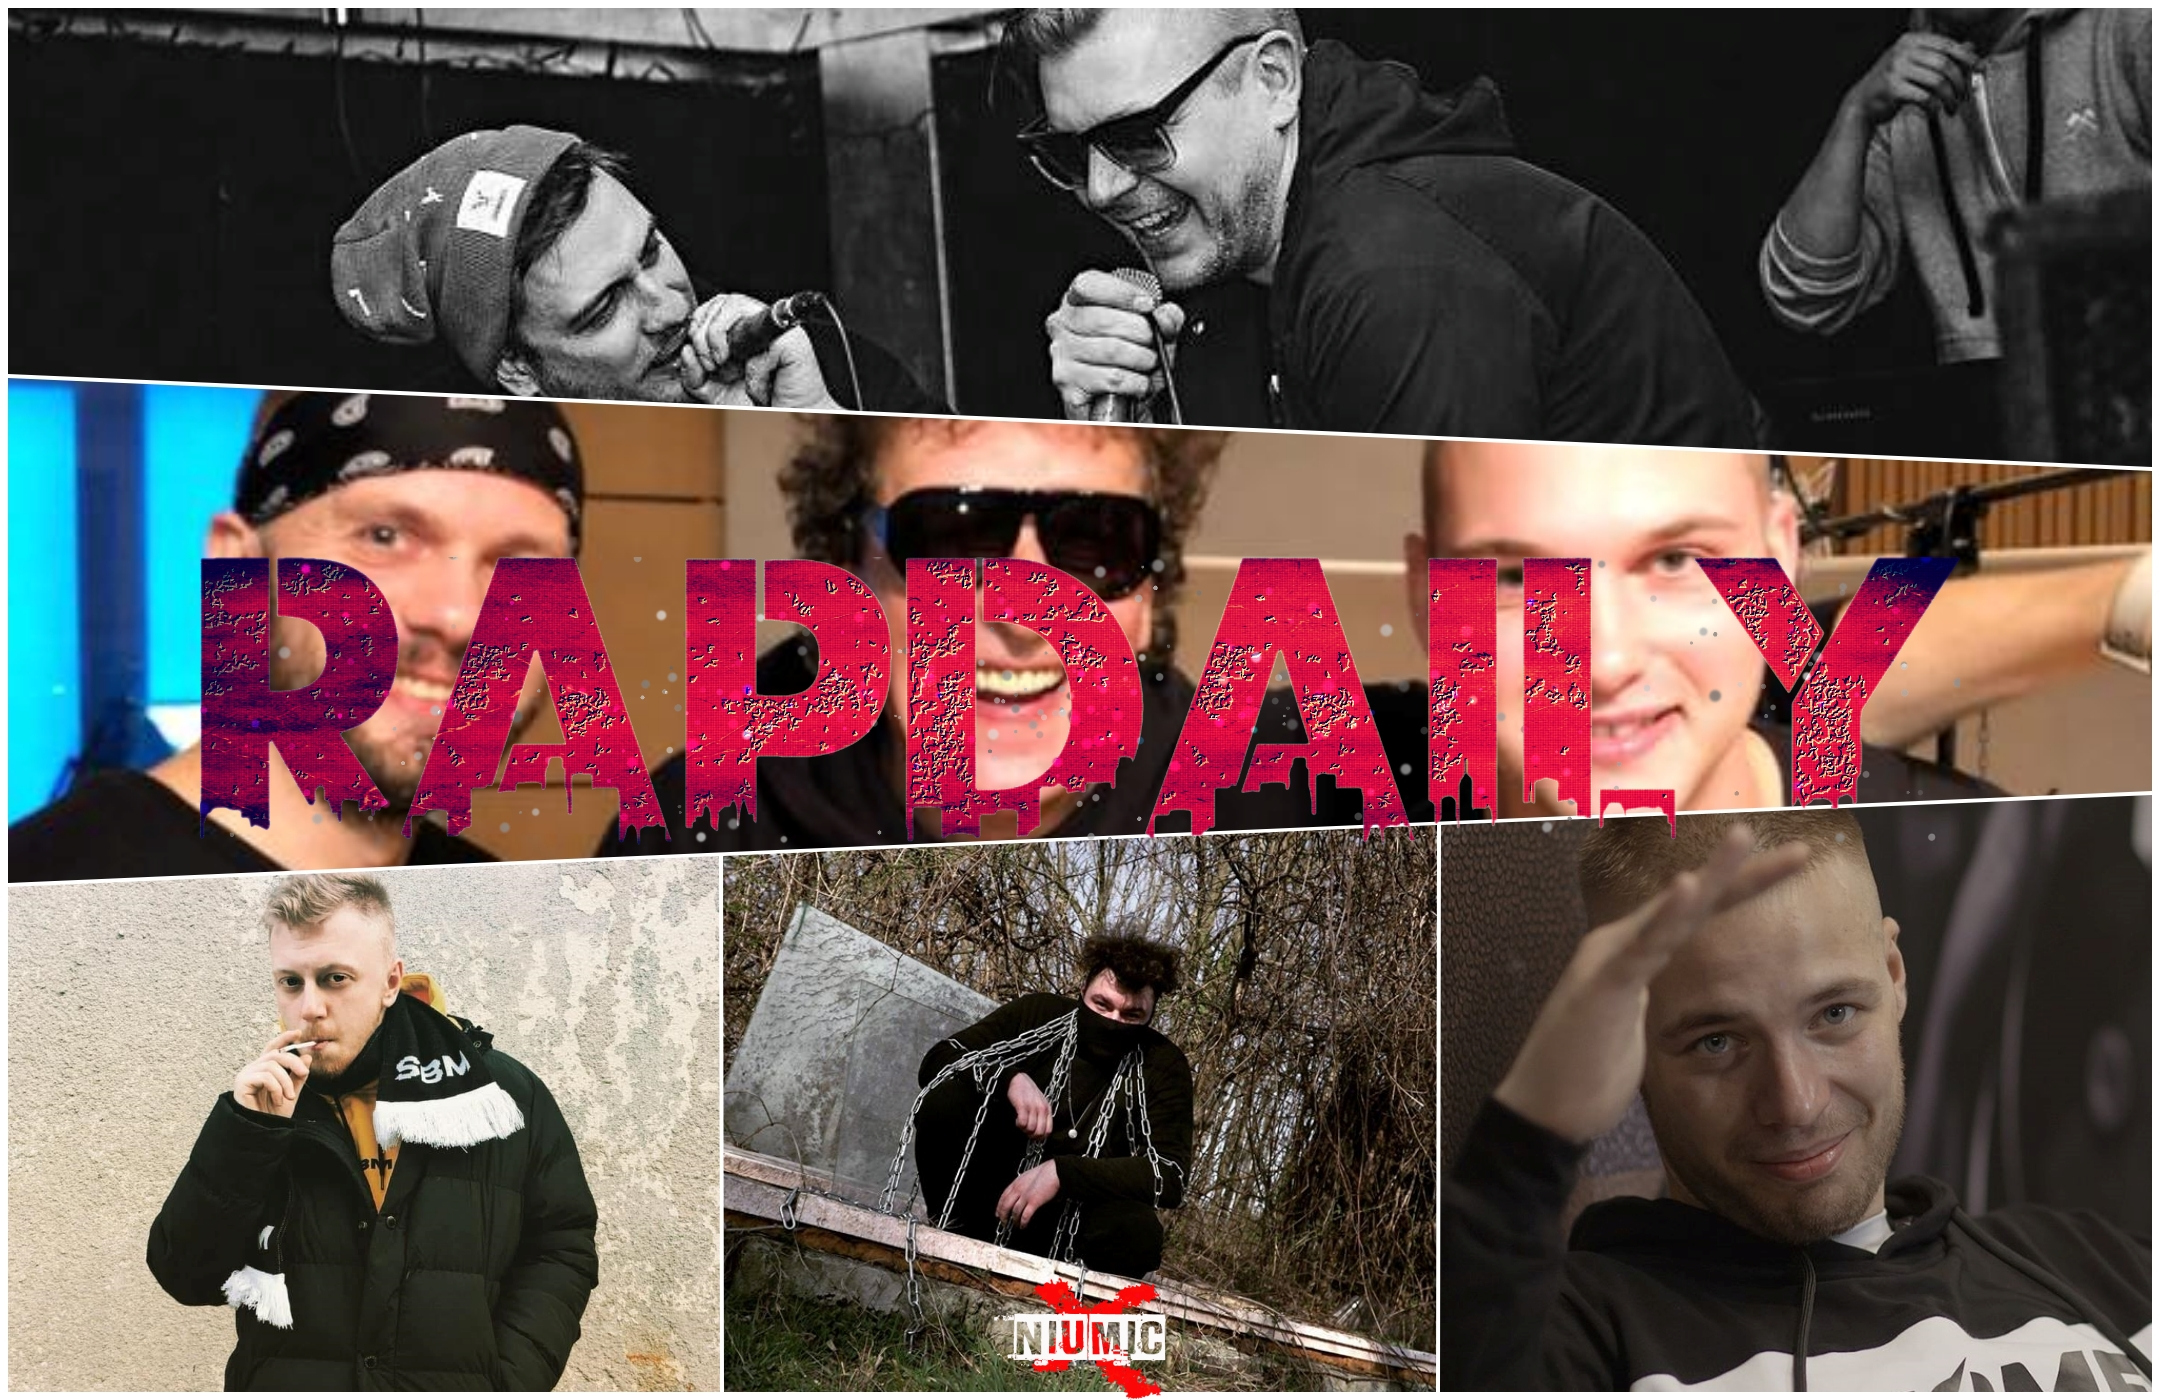 Laikike1 | Tomb | Wac Toja | Karian | Beteo || #RapDaily